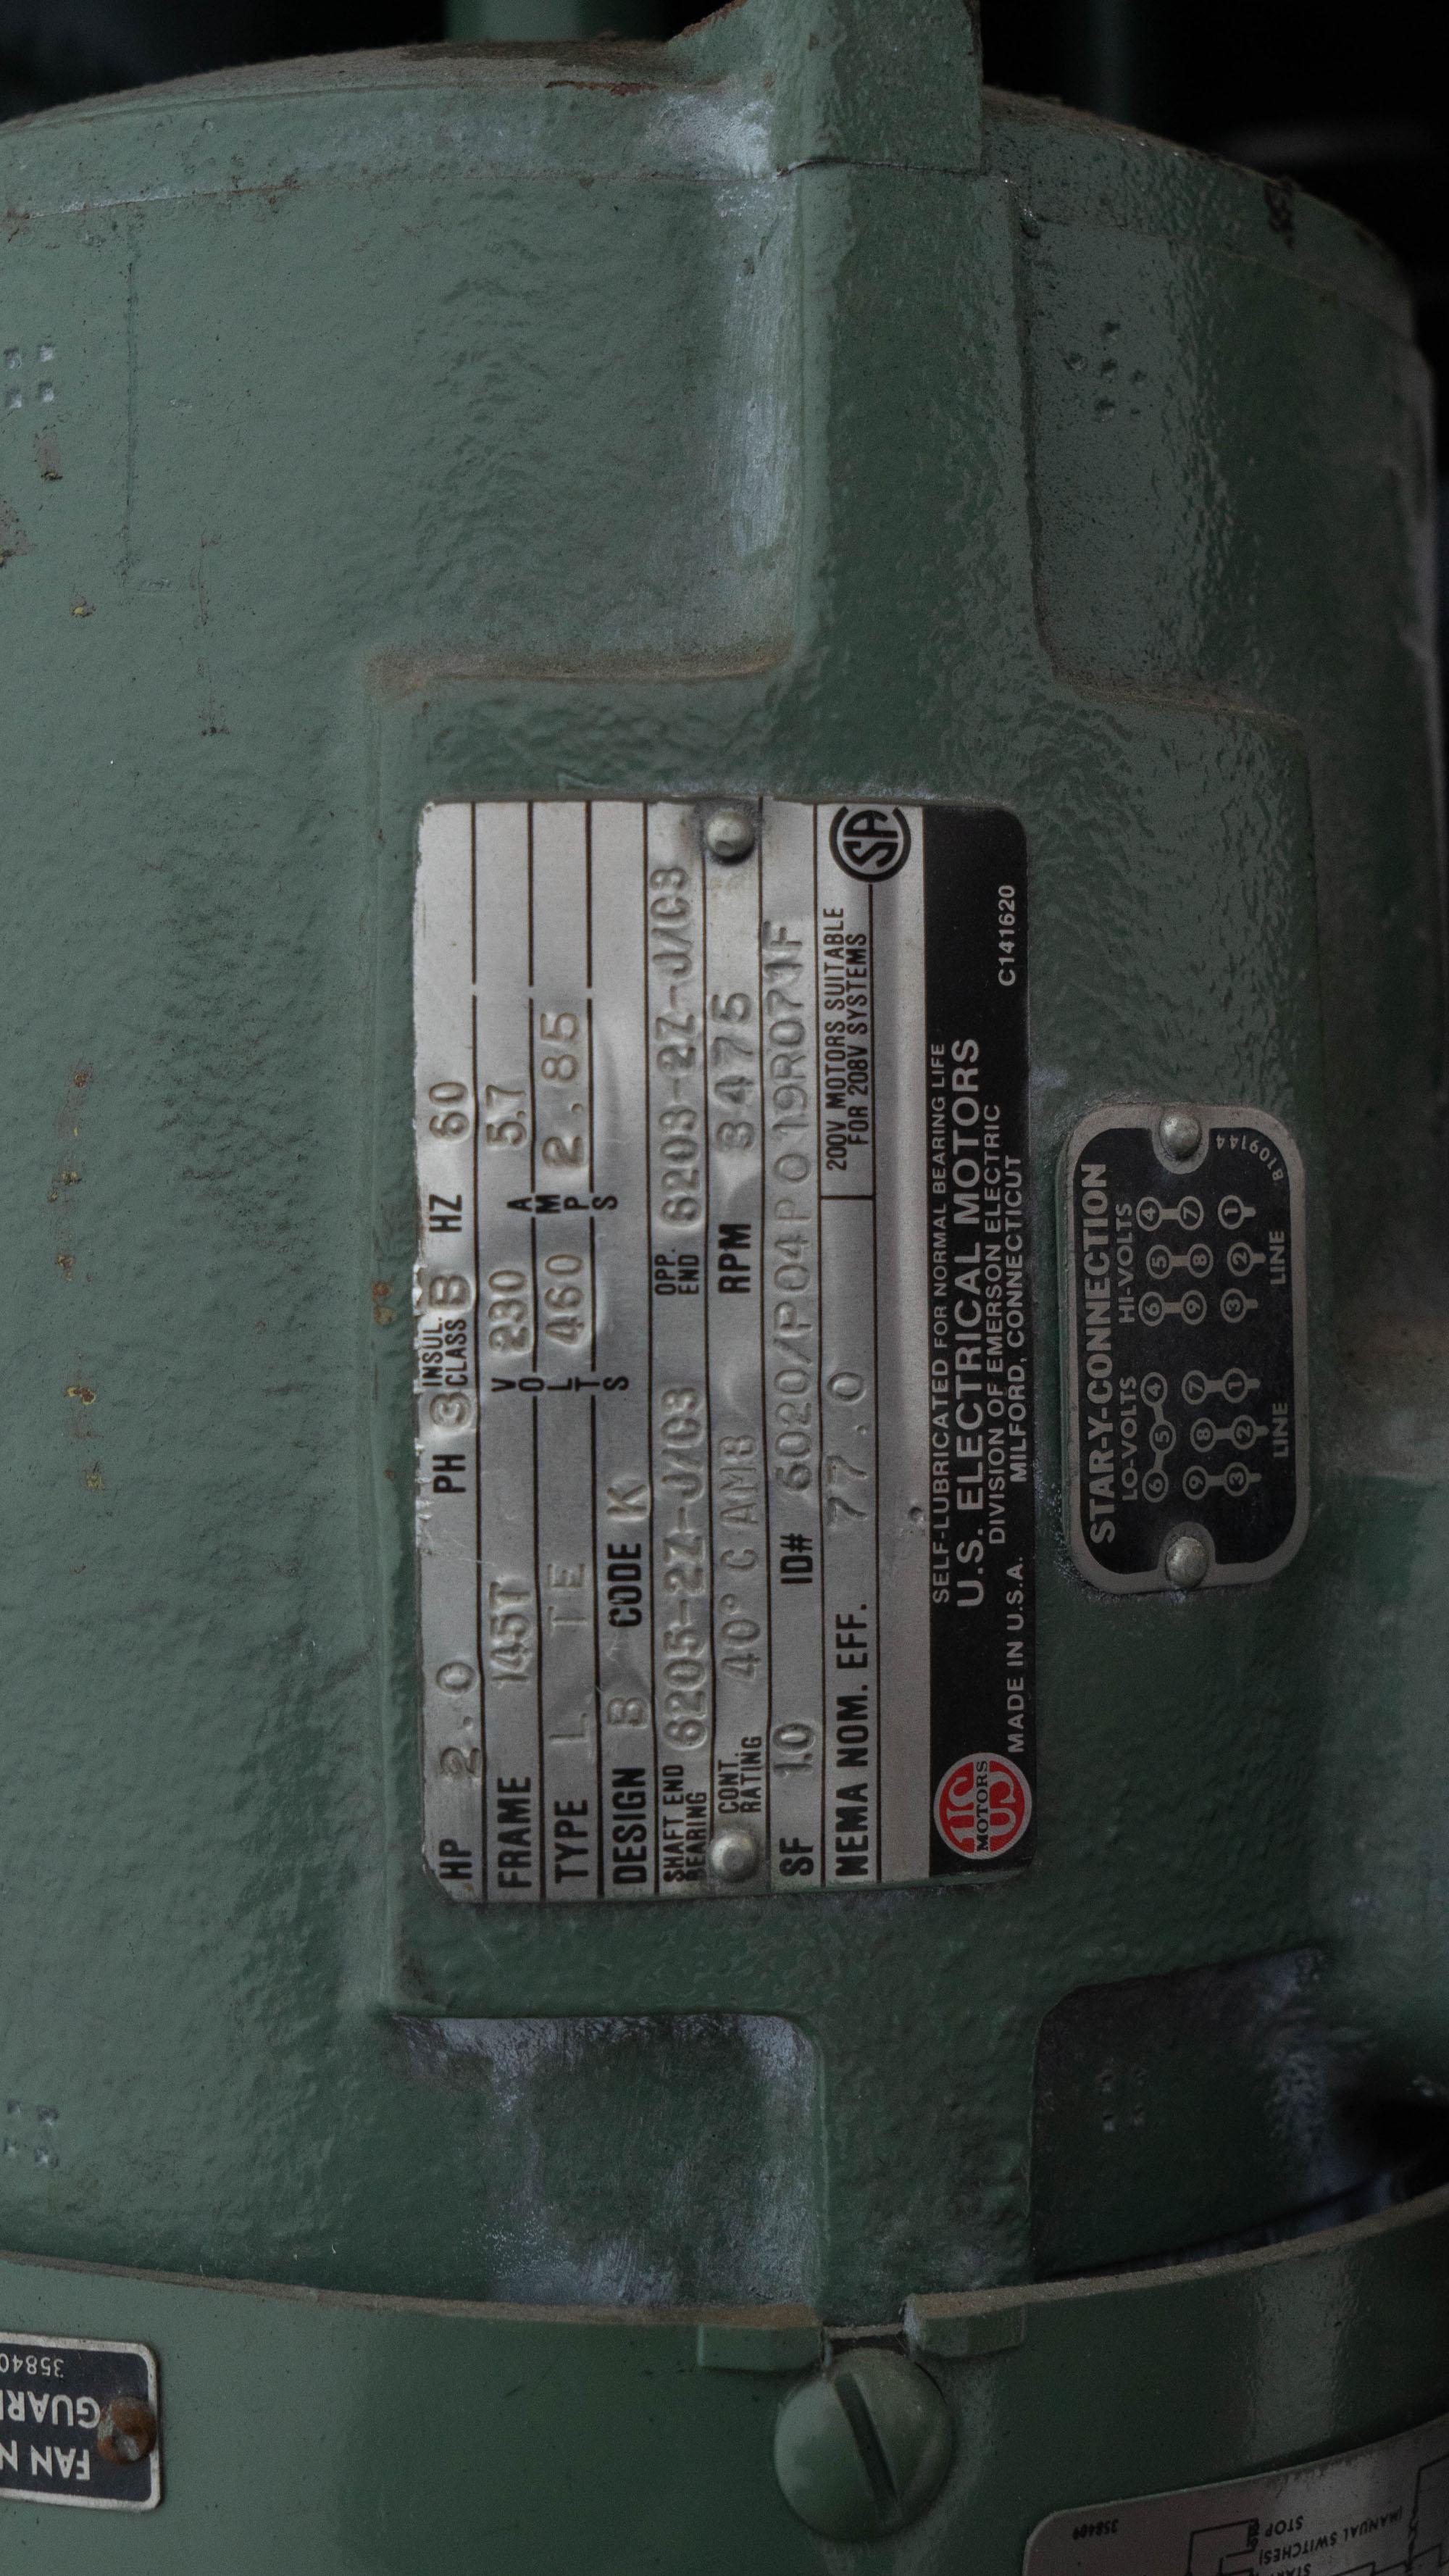 2 HP Myers Vacuum Mixer, Model VL775A-2, S/S, XP